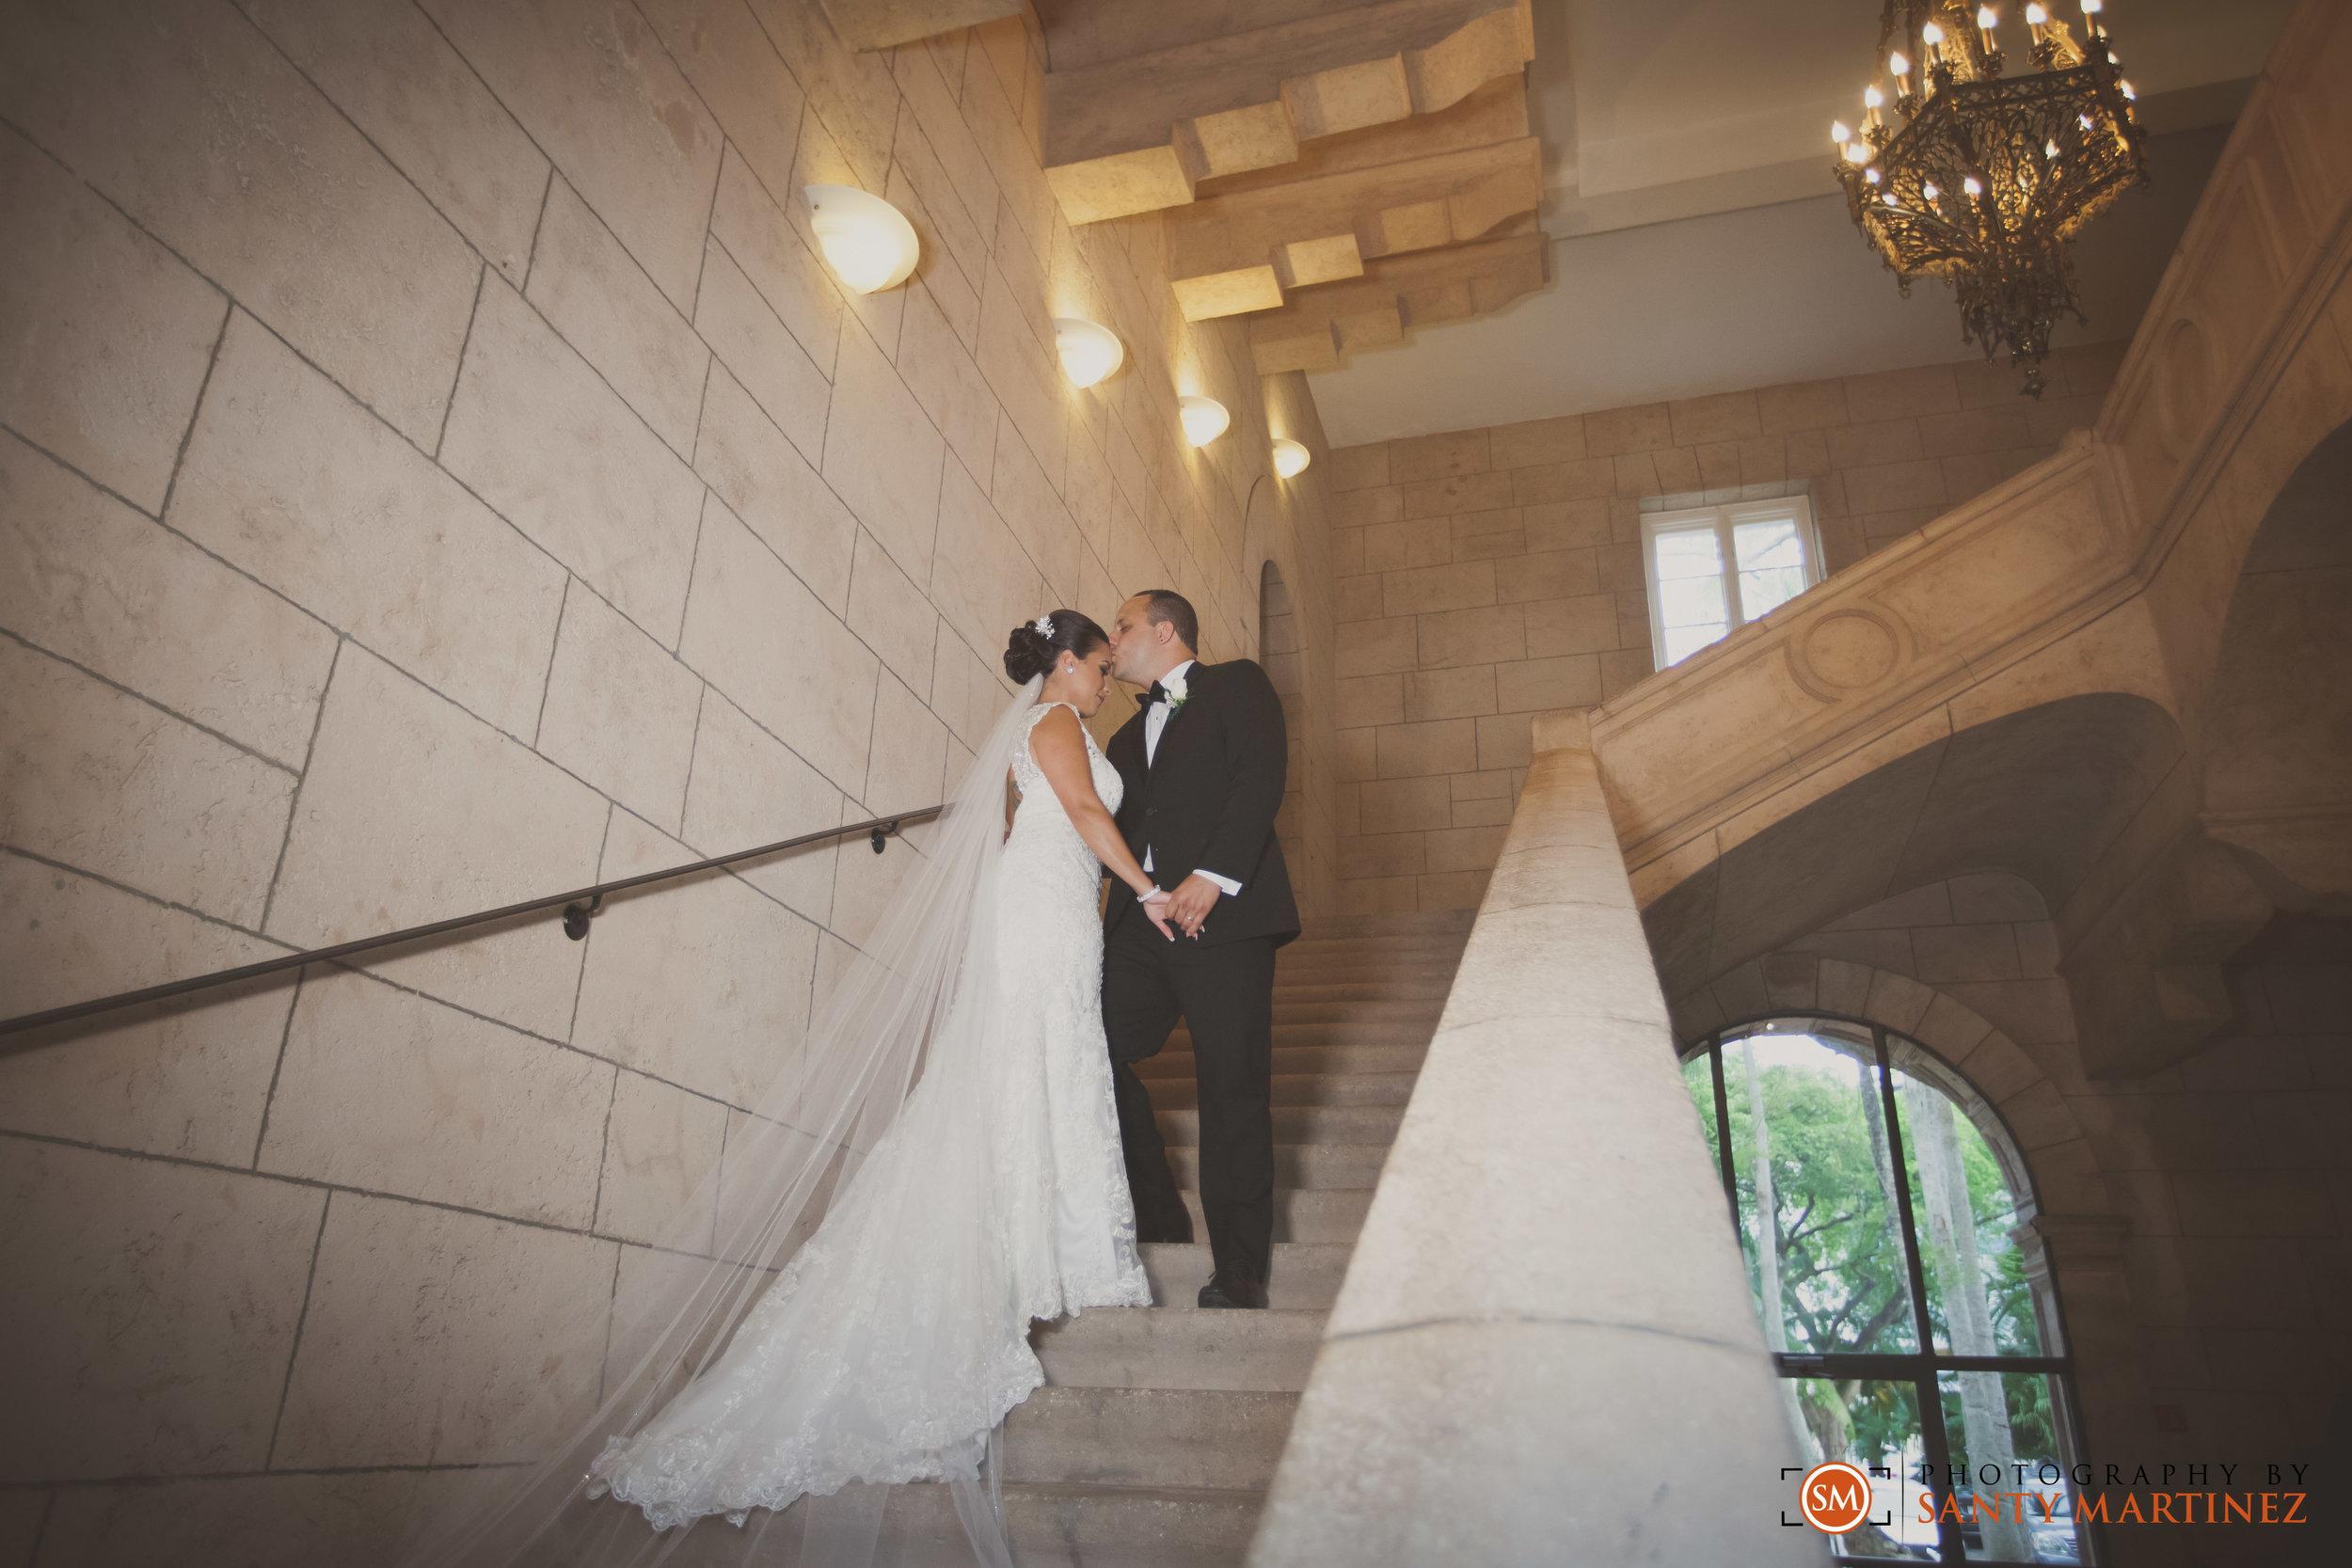 Wedding Douglas Entrance - Photography by Santy Martinez-2-2.jpg